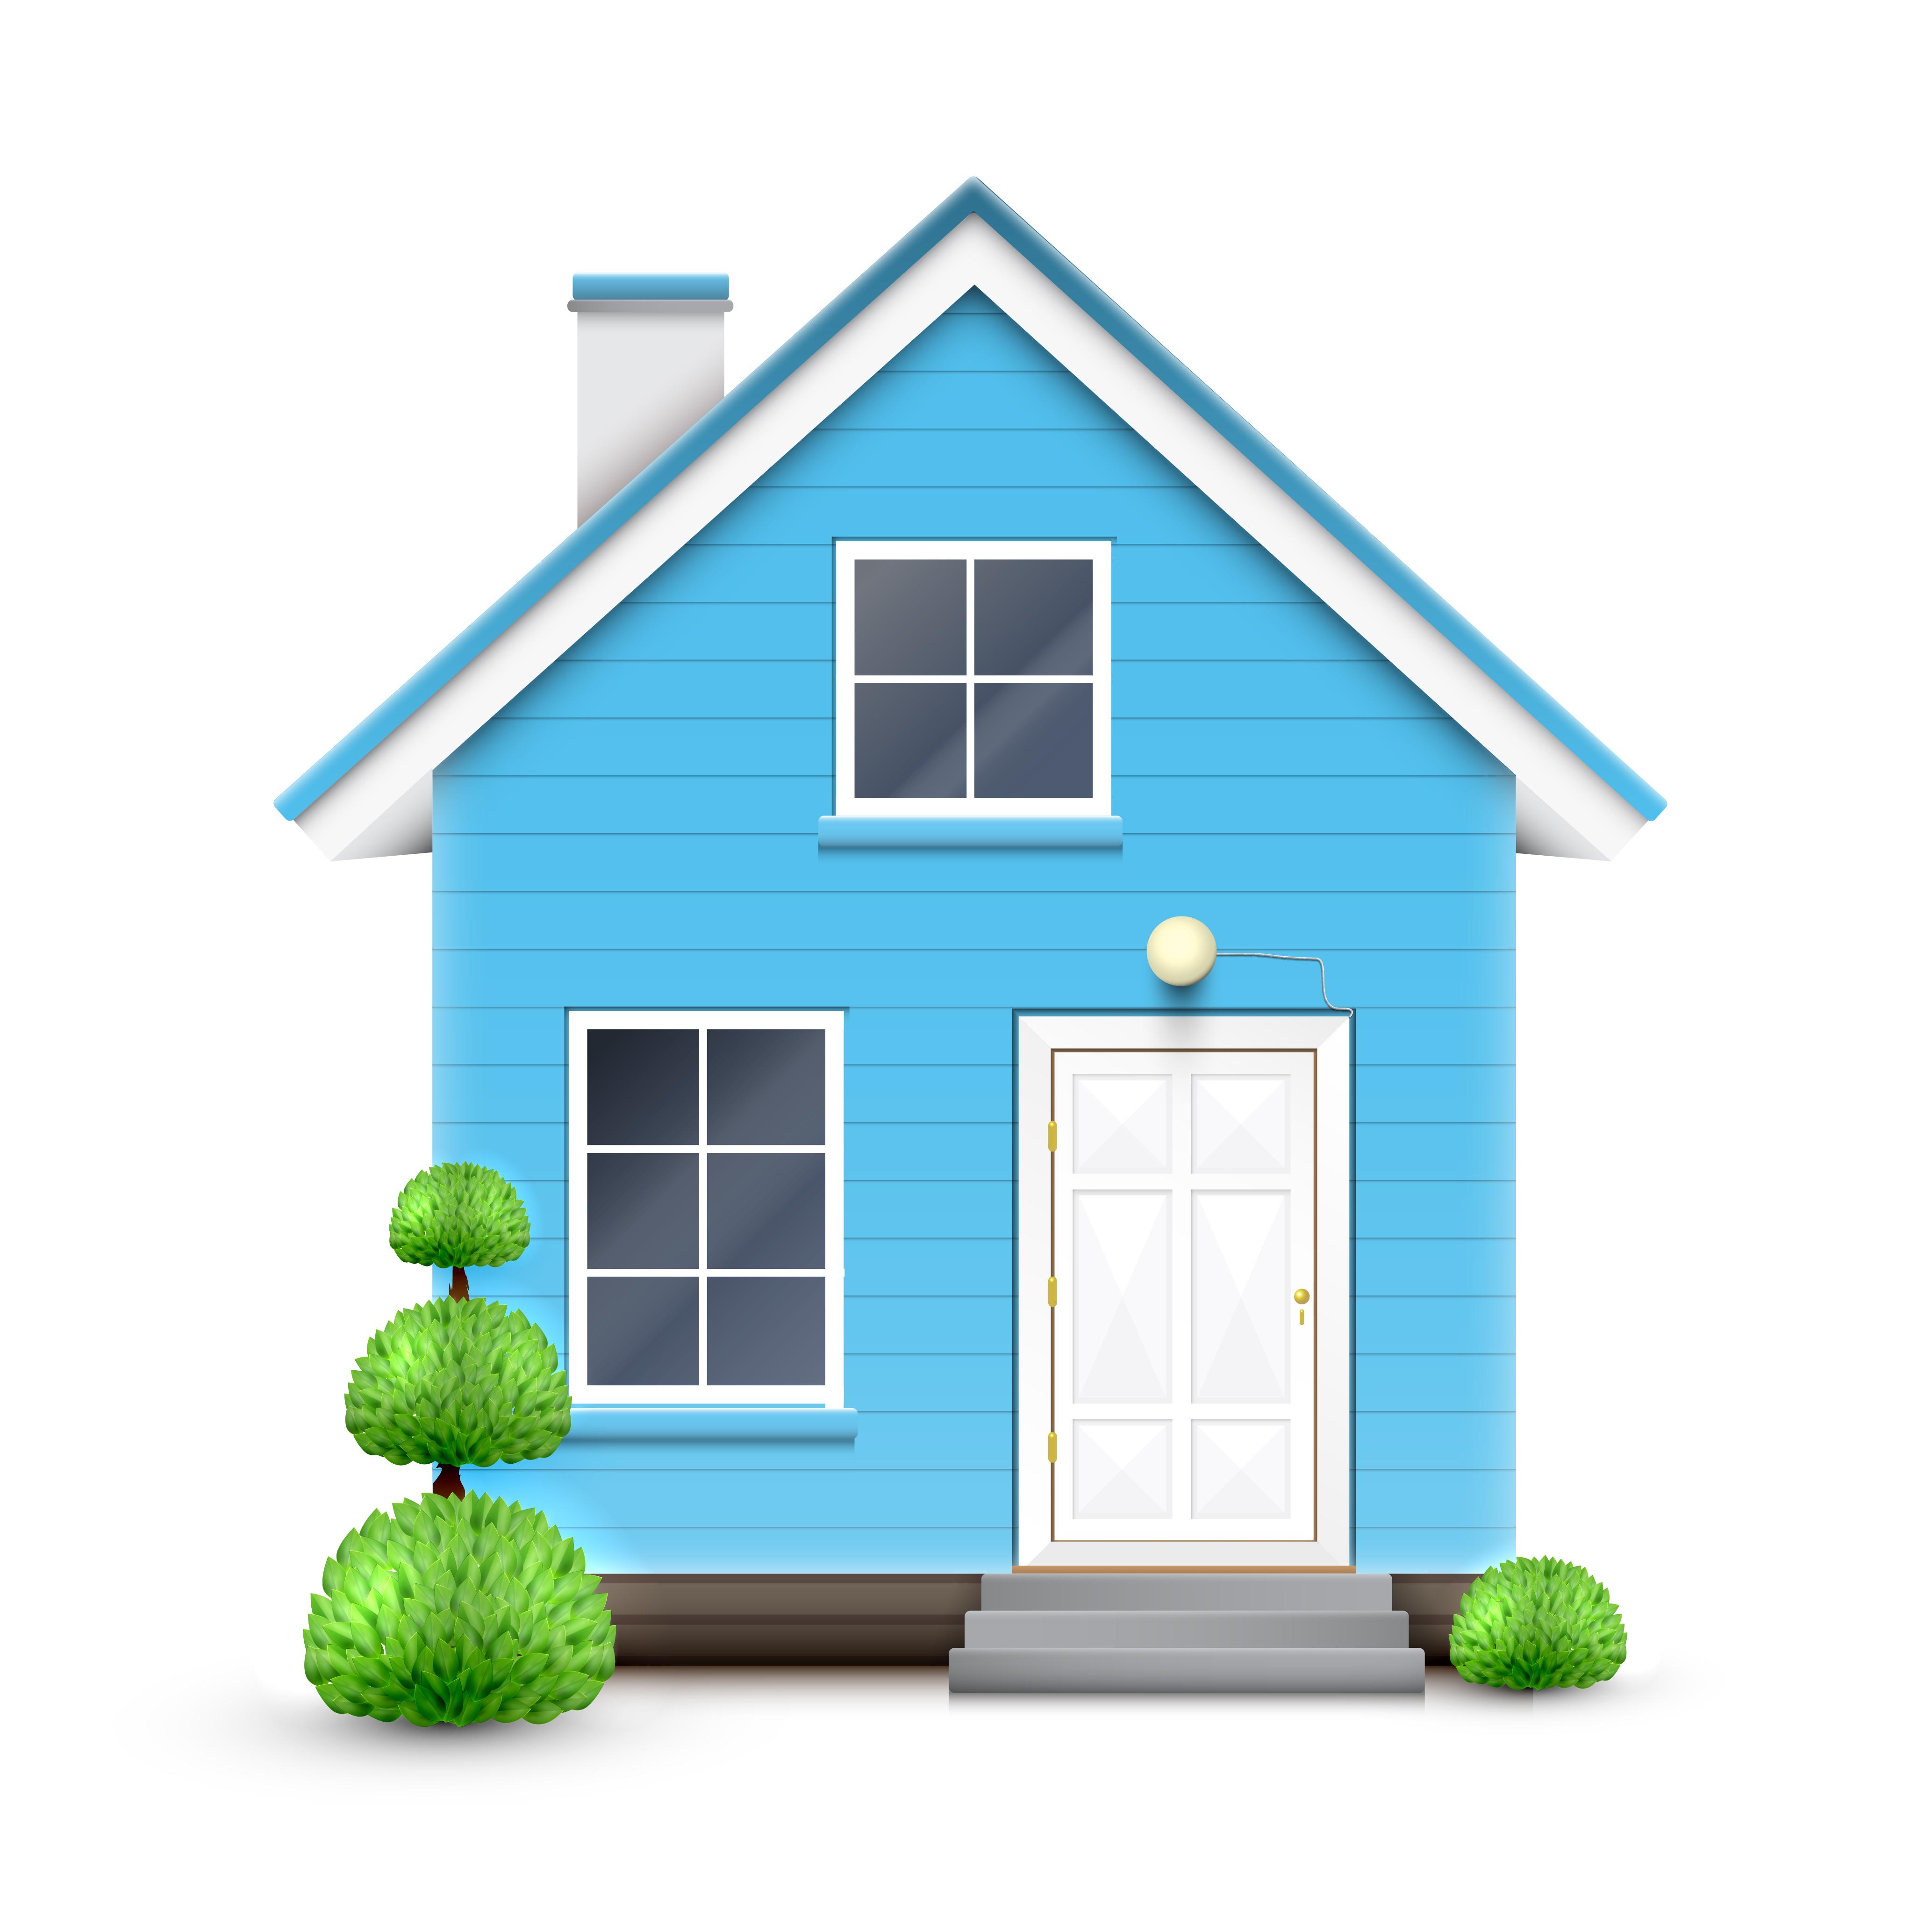 Realistic house vector download free vectors clipart for Home design 3d professional italiano gratis